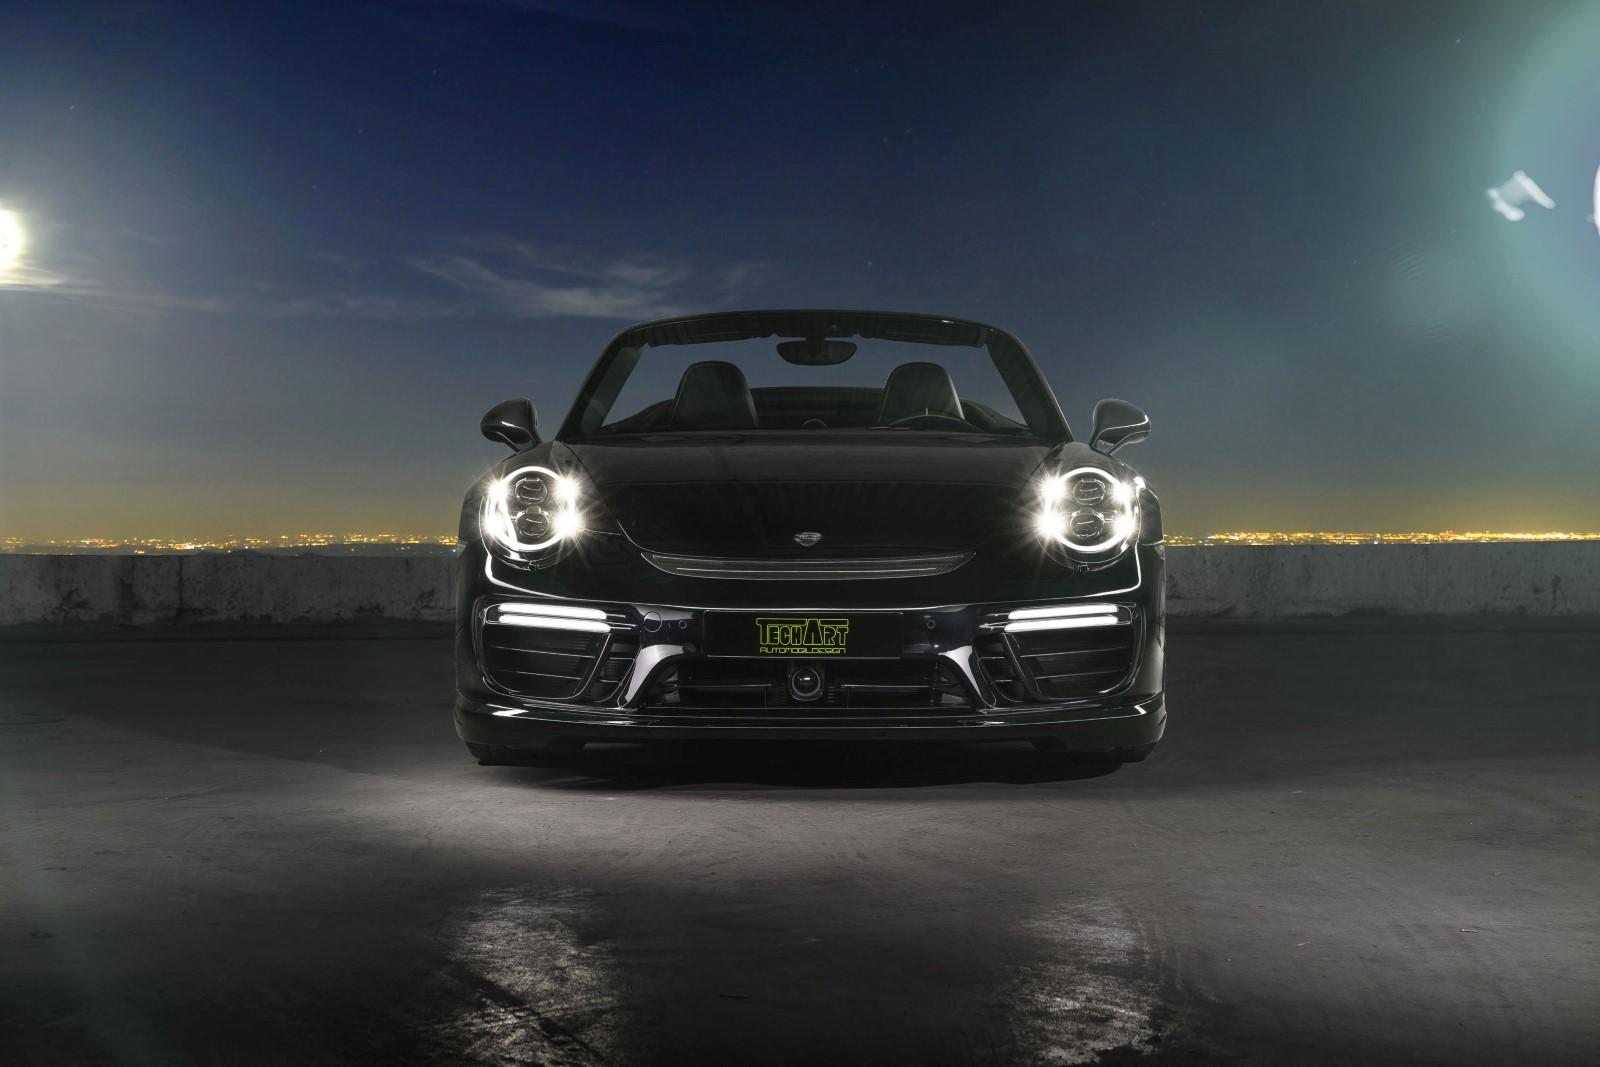 TechArt-Porsche-991-2-Turbo-S-cabrio-001.jpg